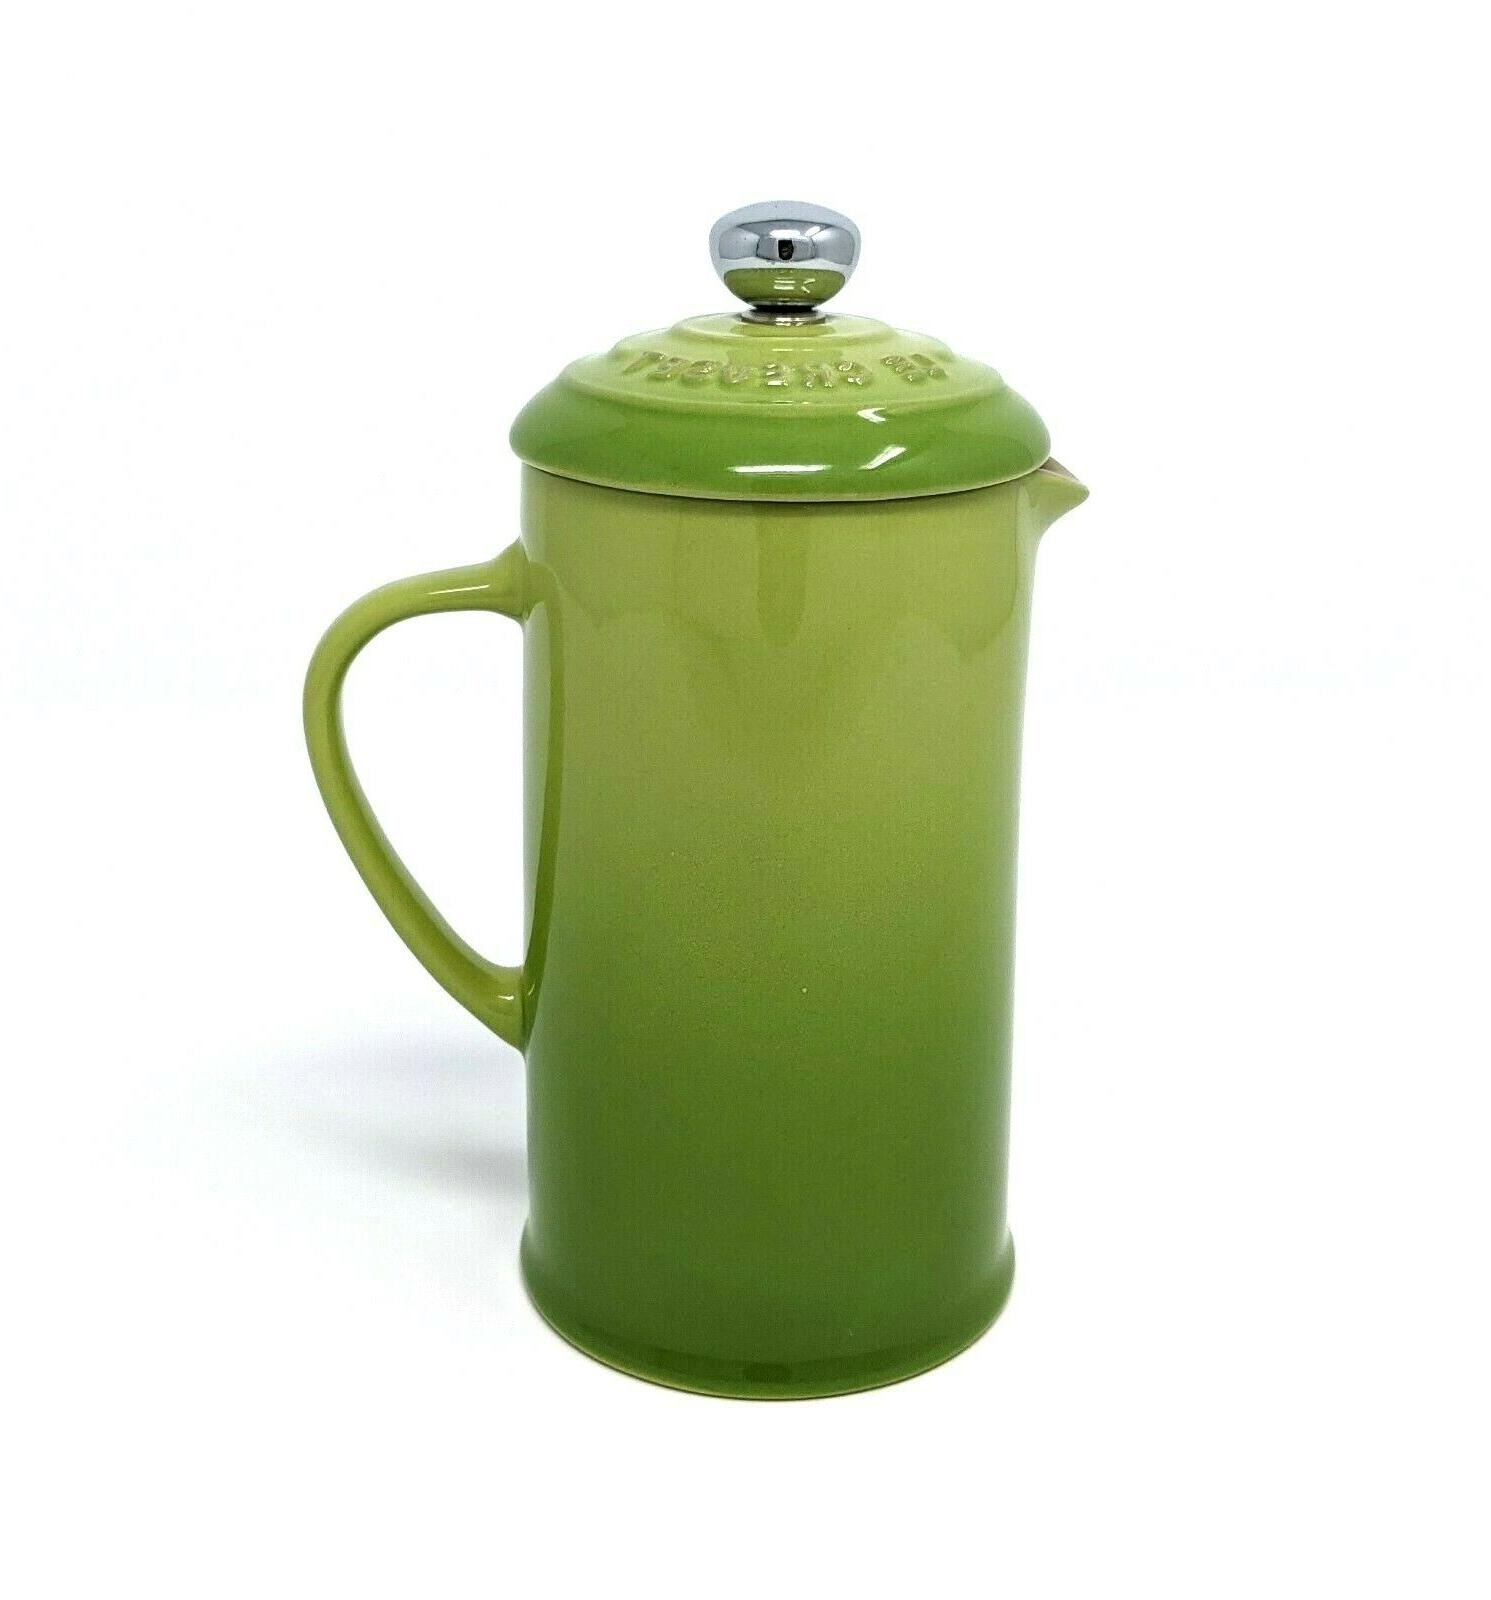 french press 12oz 350ml ceramic palm green